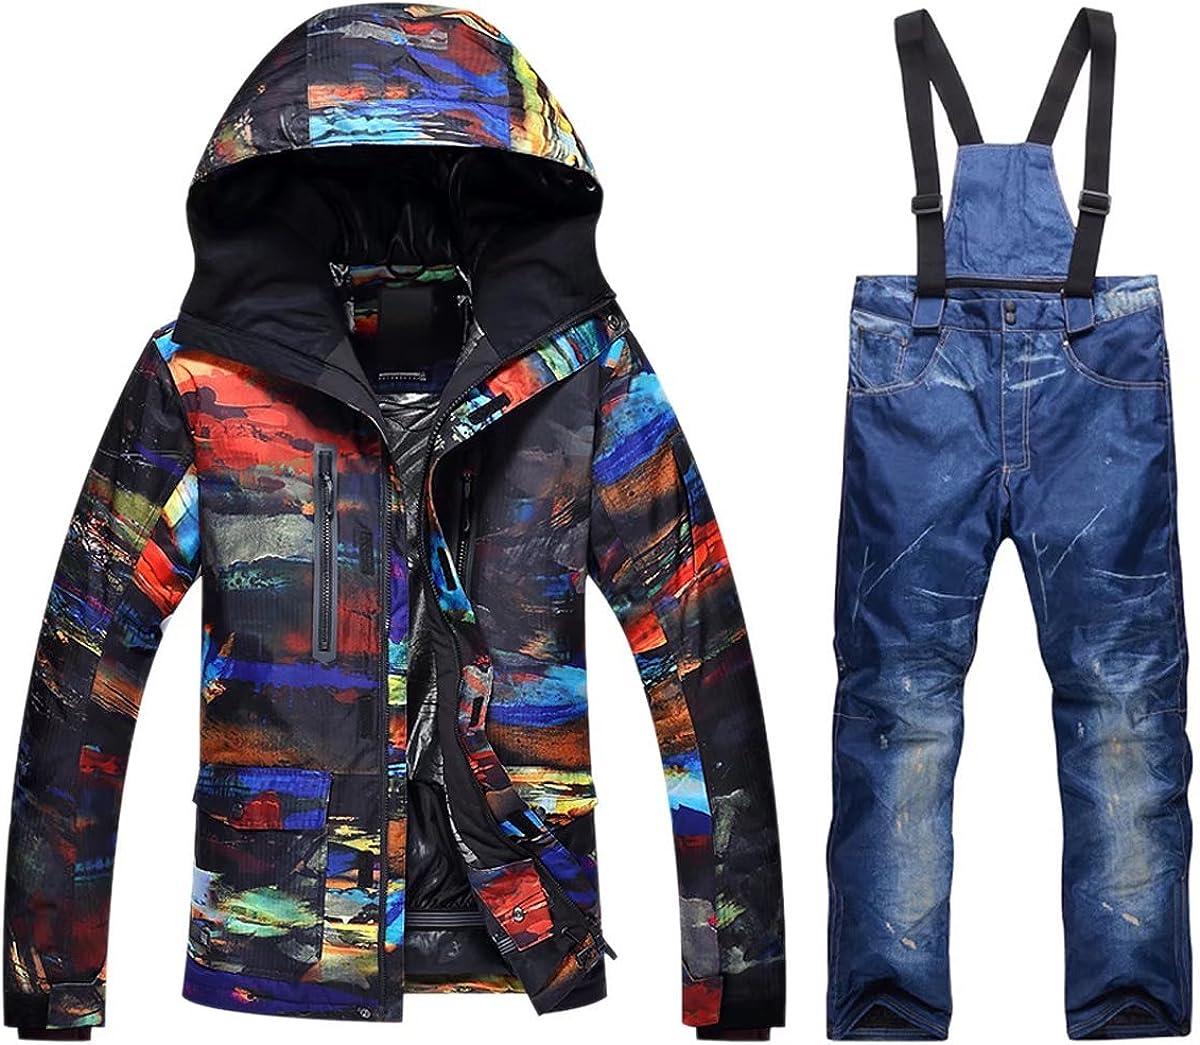 OLEK Womens High Waterproof Windproof Technology Colorful Snowboarding Jacket Ski Pants Set